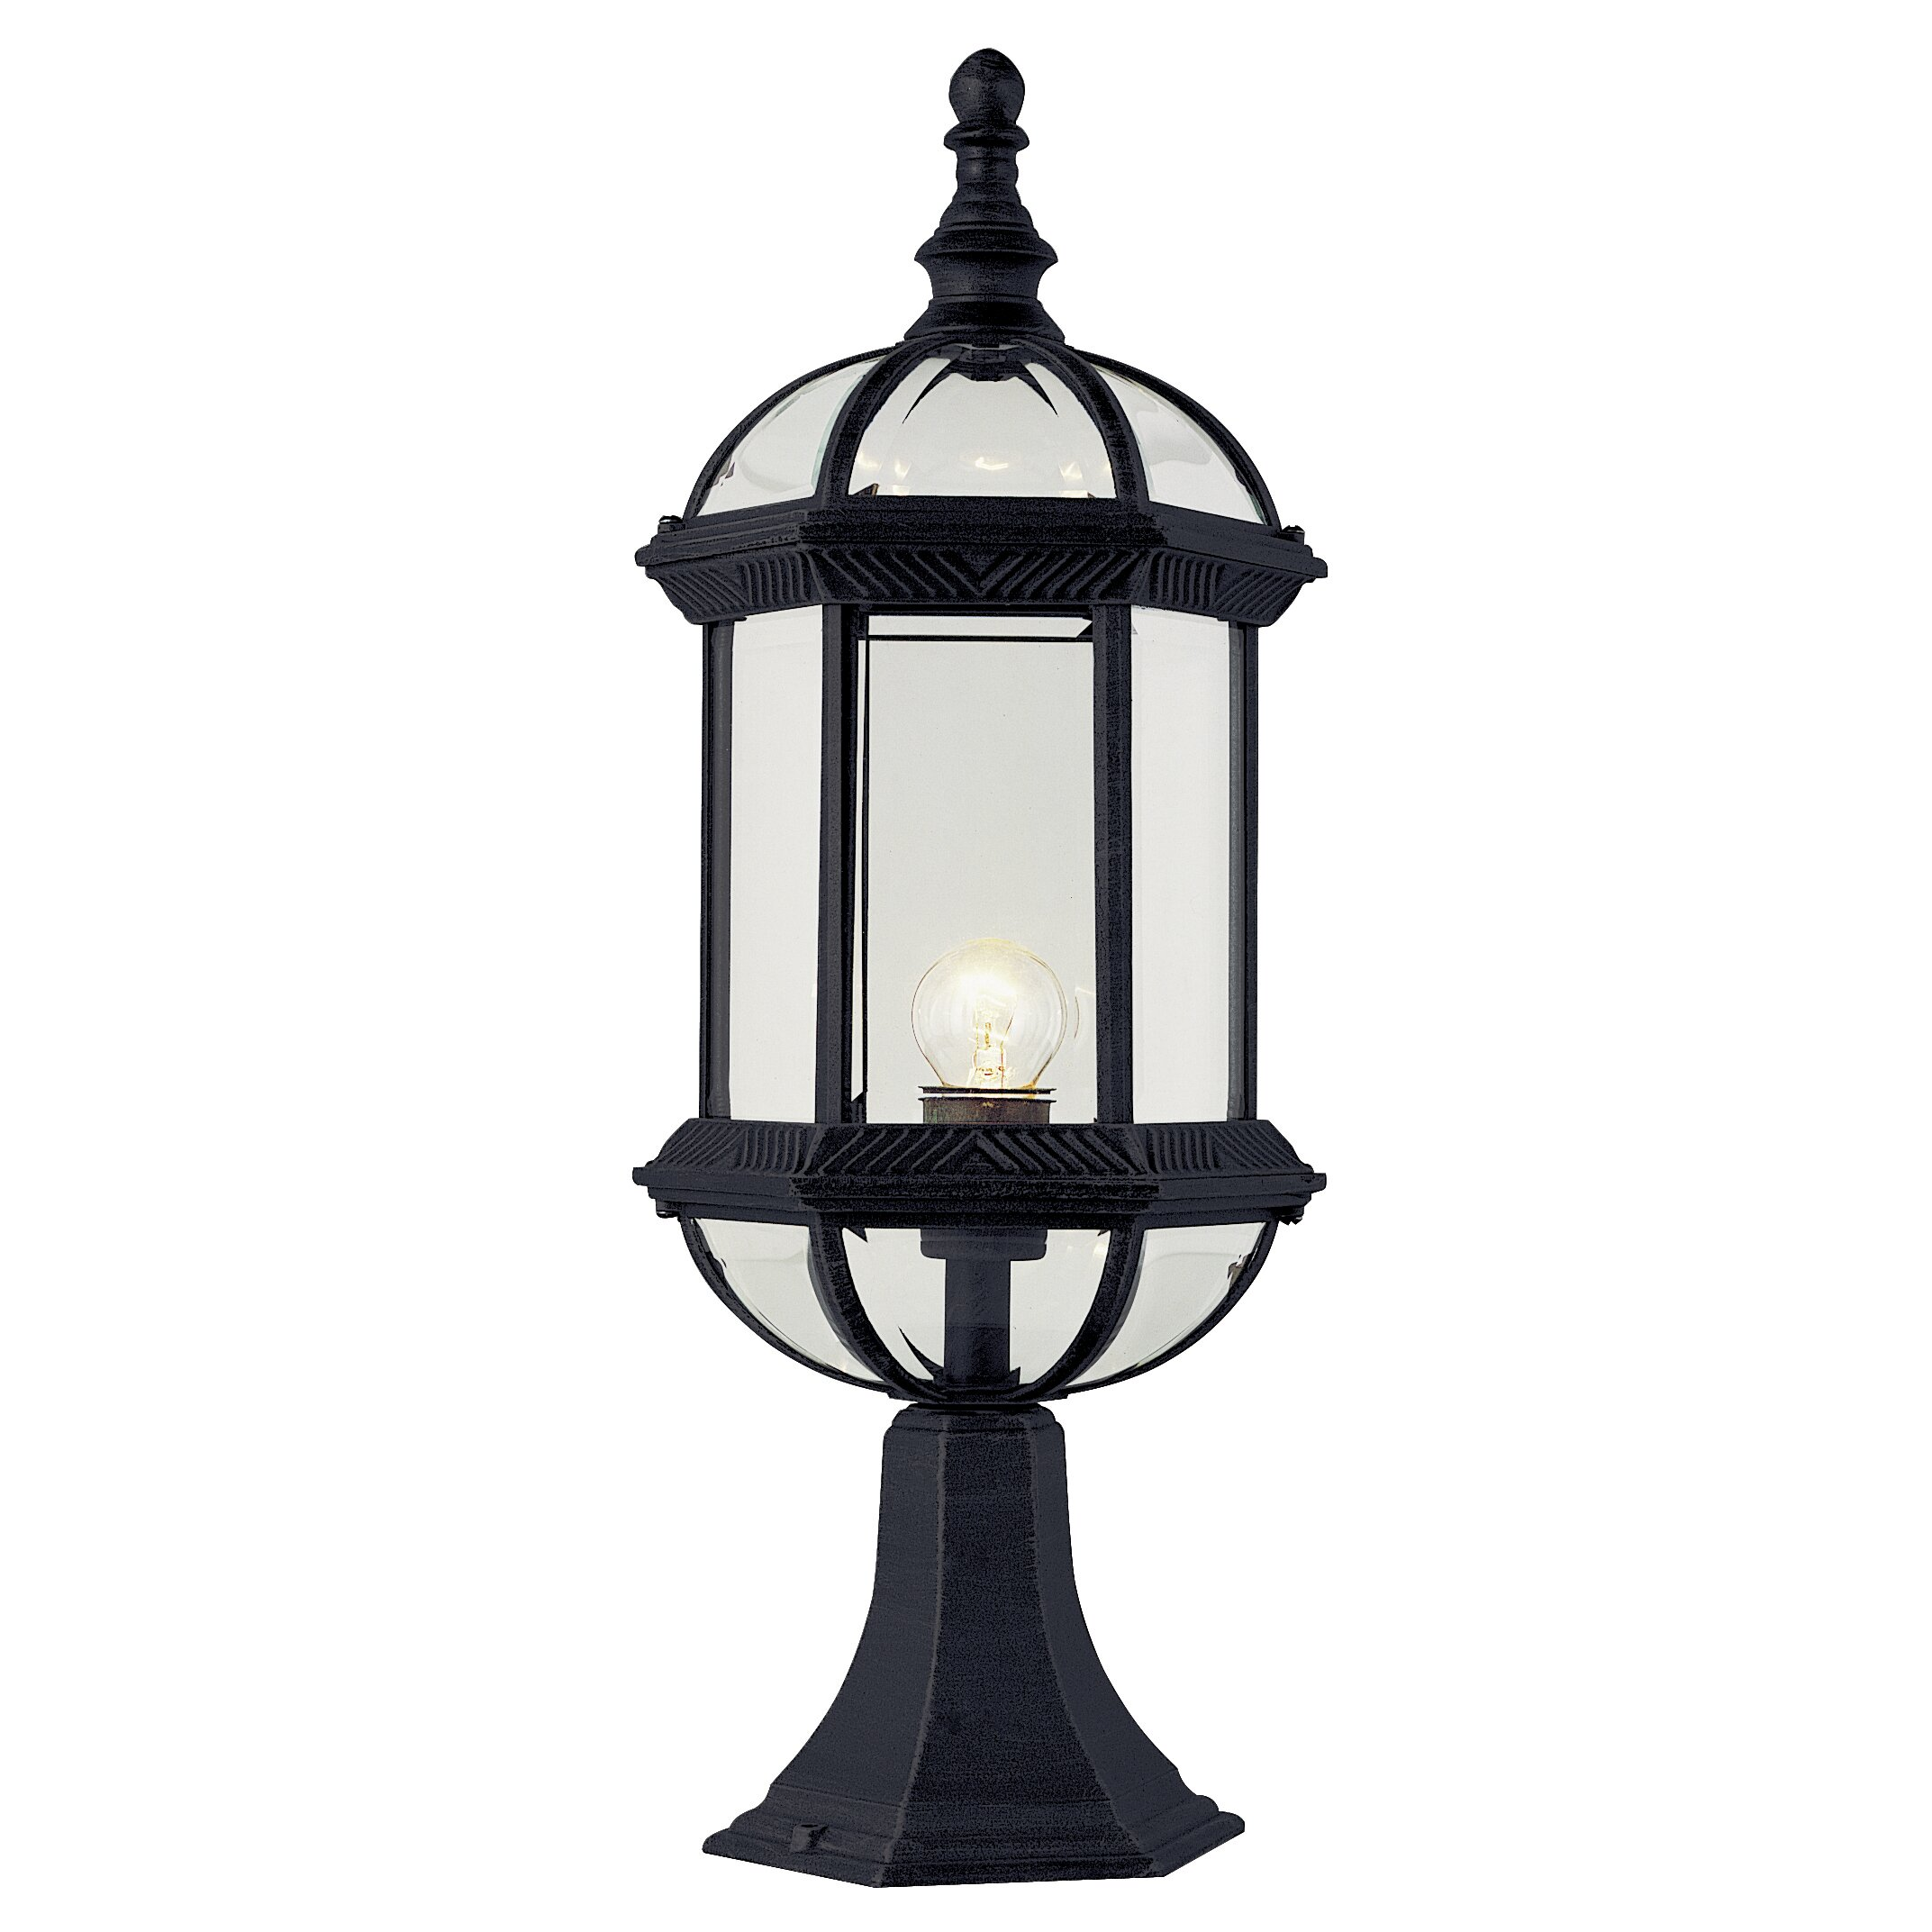 transglobe lighting outdoor 1 light pier mount light. Black Bedroom Furniture Sets. Home Design Ideas